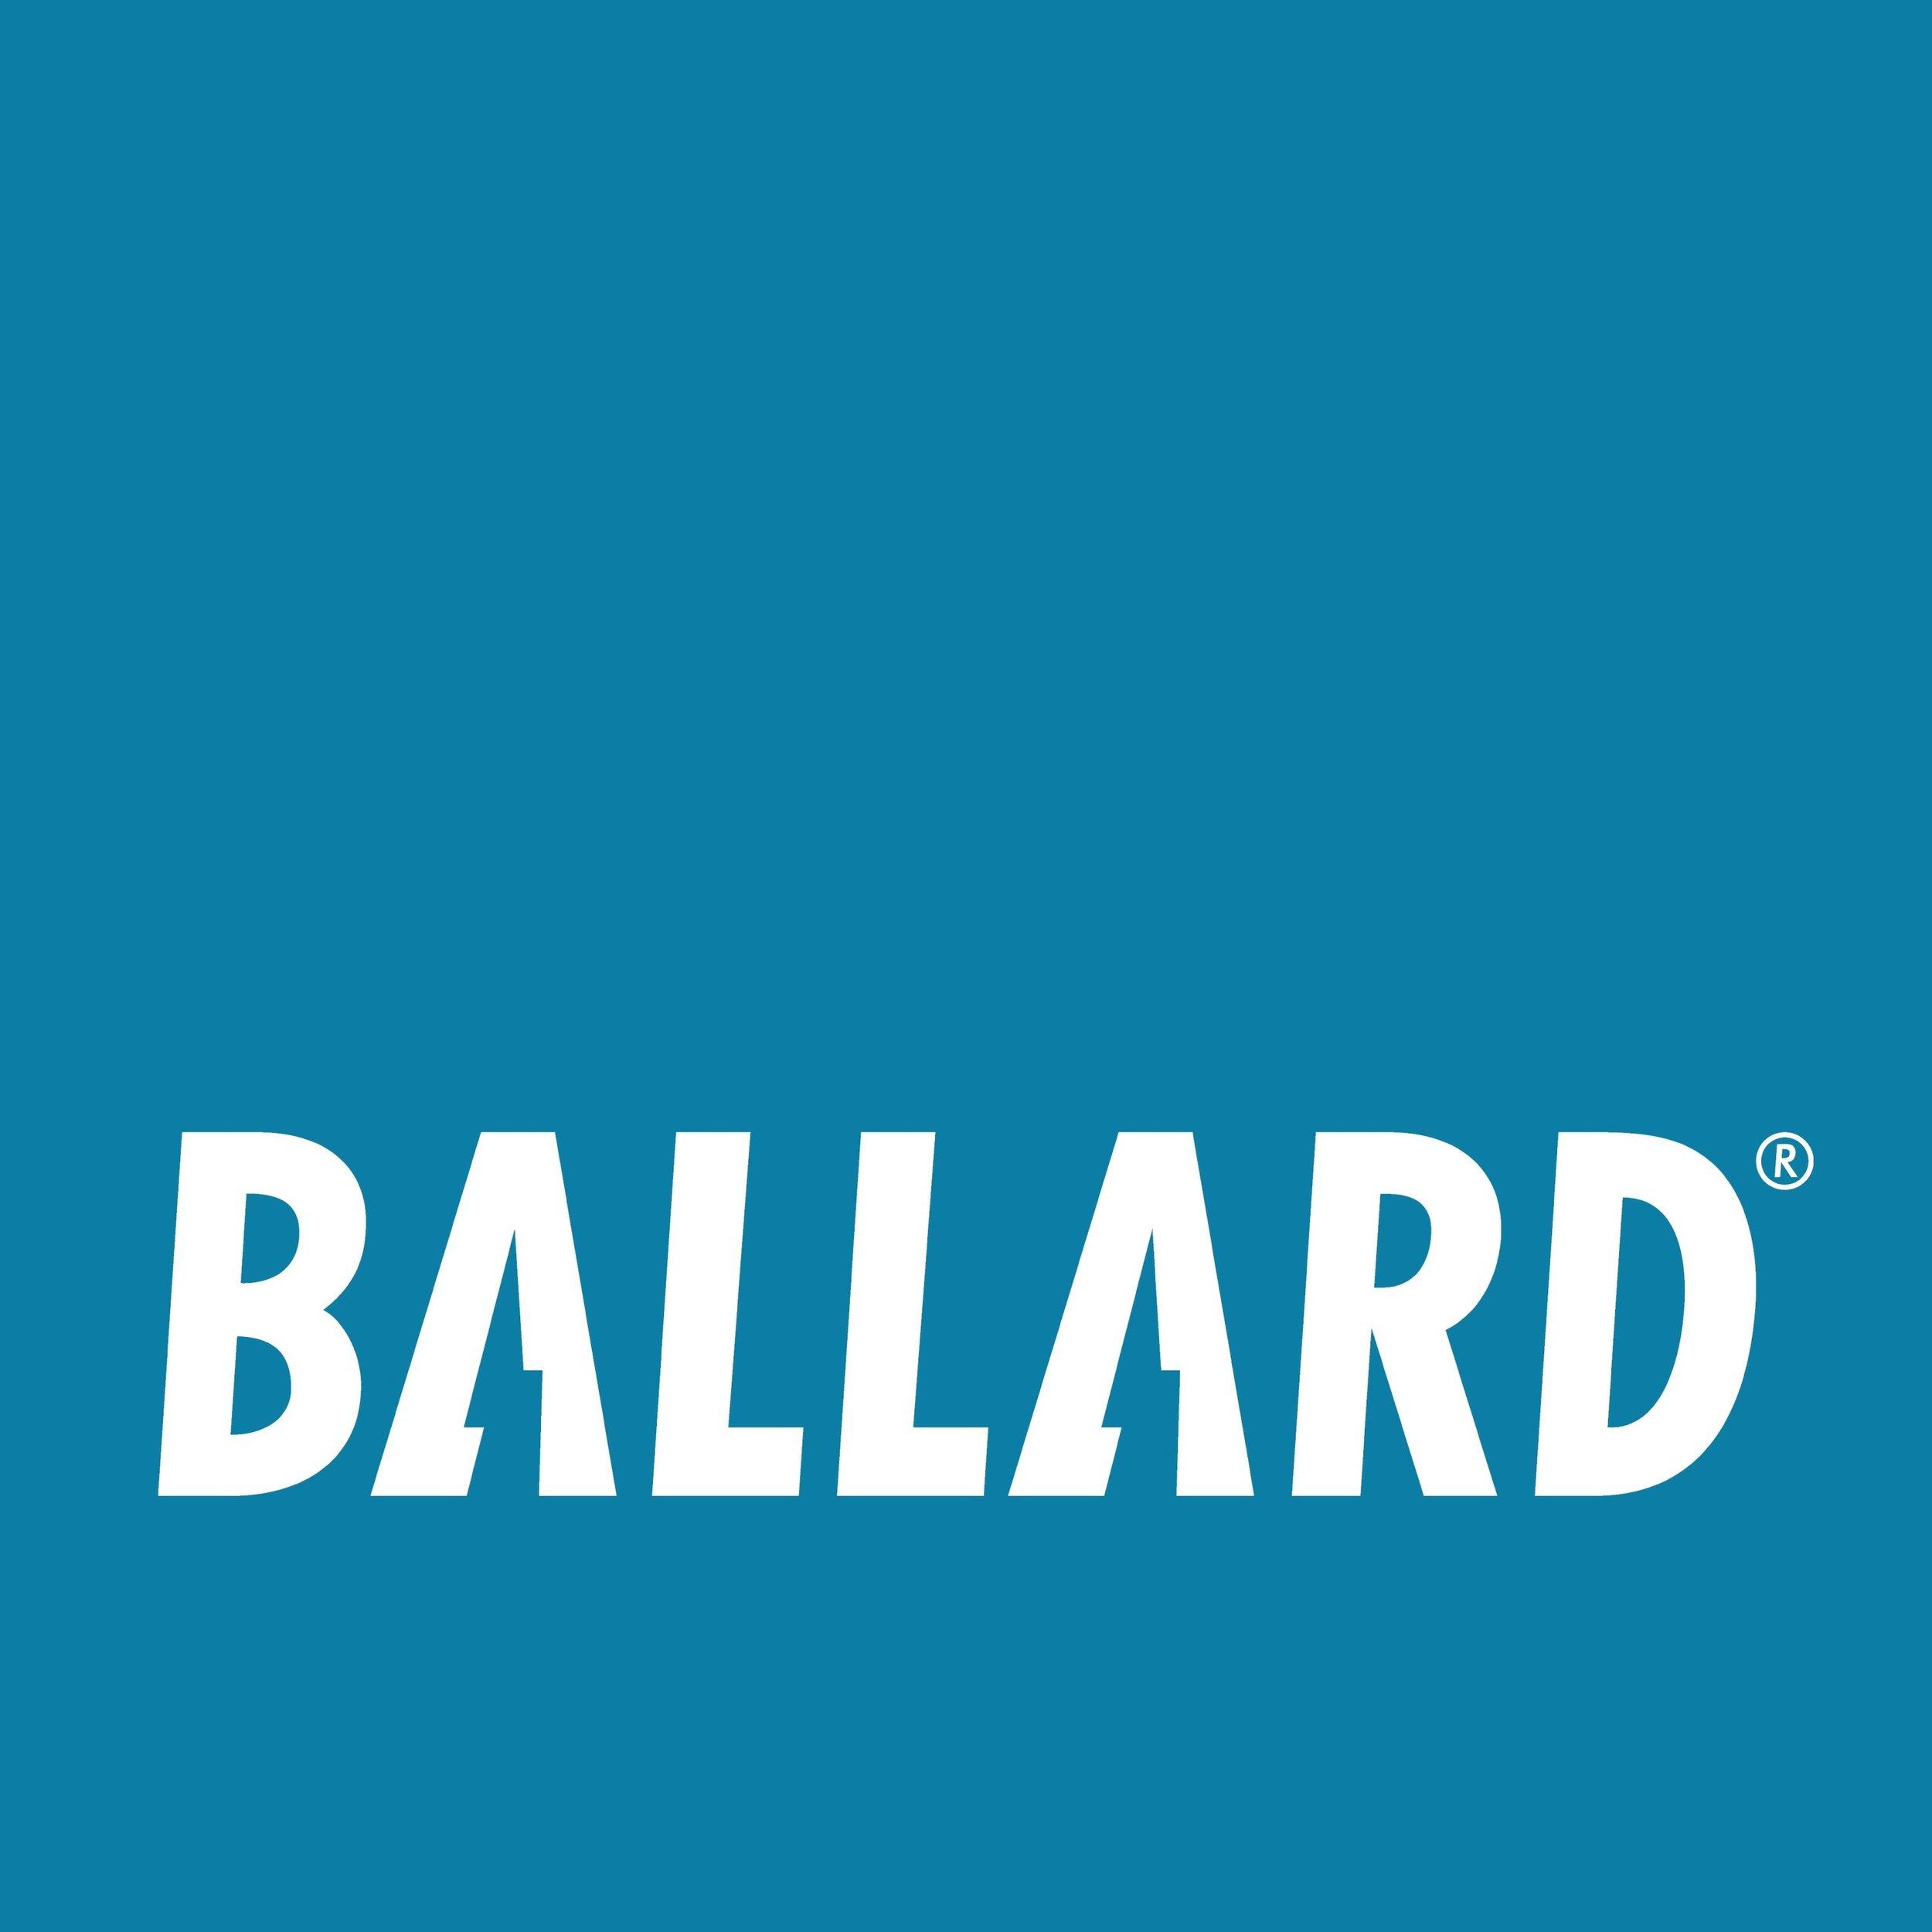 Ballard_Logo-Block-Large.jpg